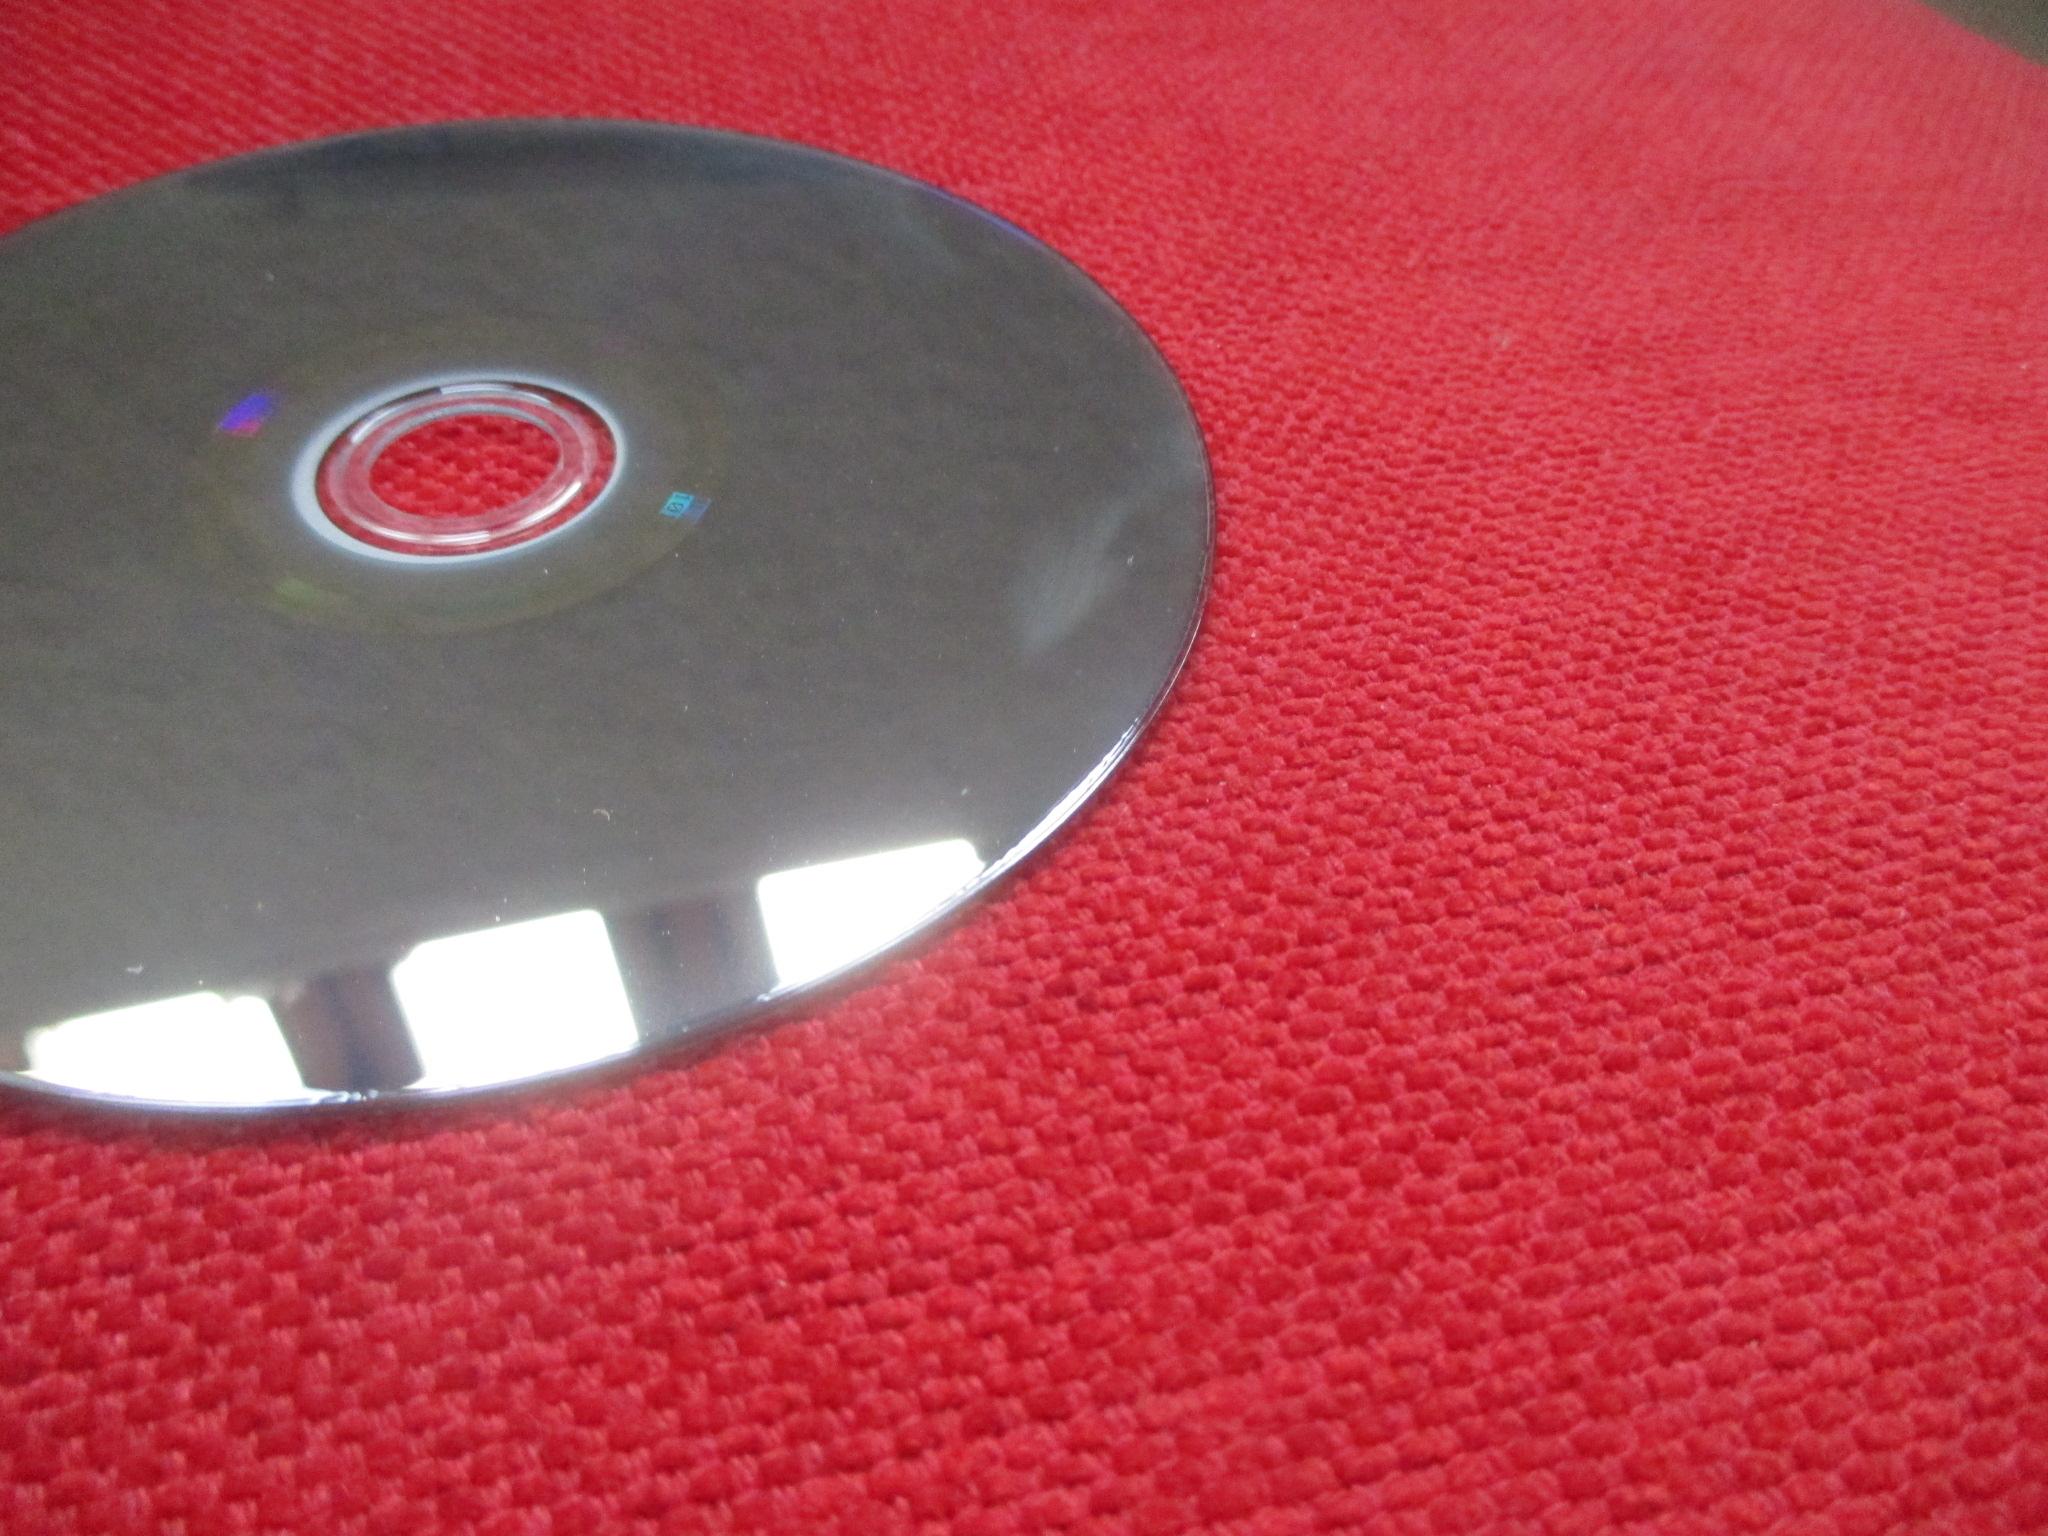 14 cleopatre disc2